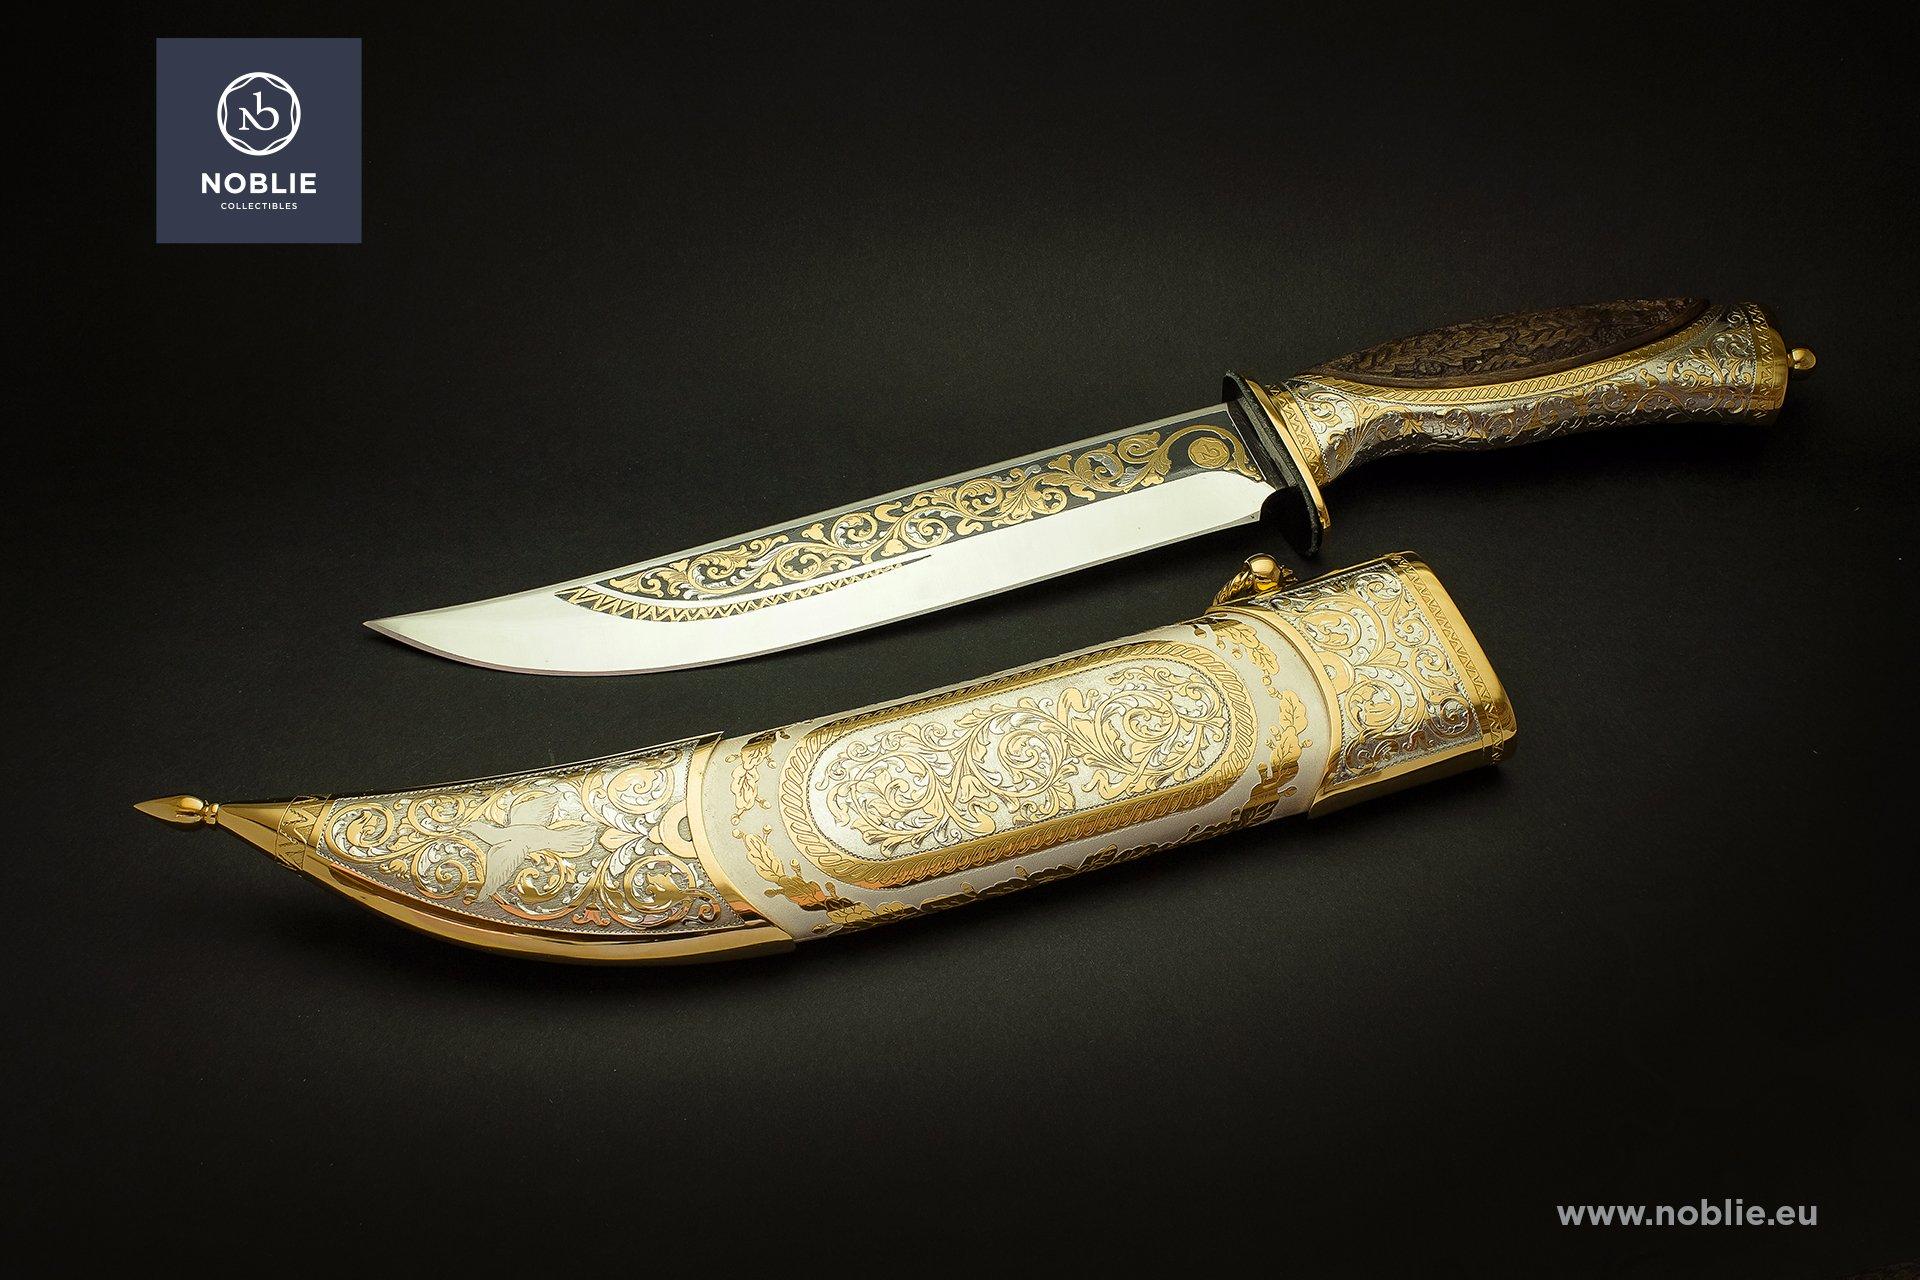 Beautiful blades